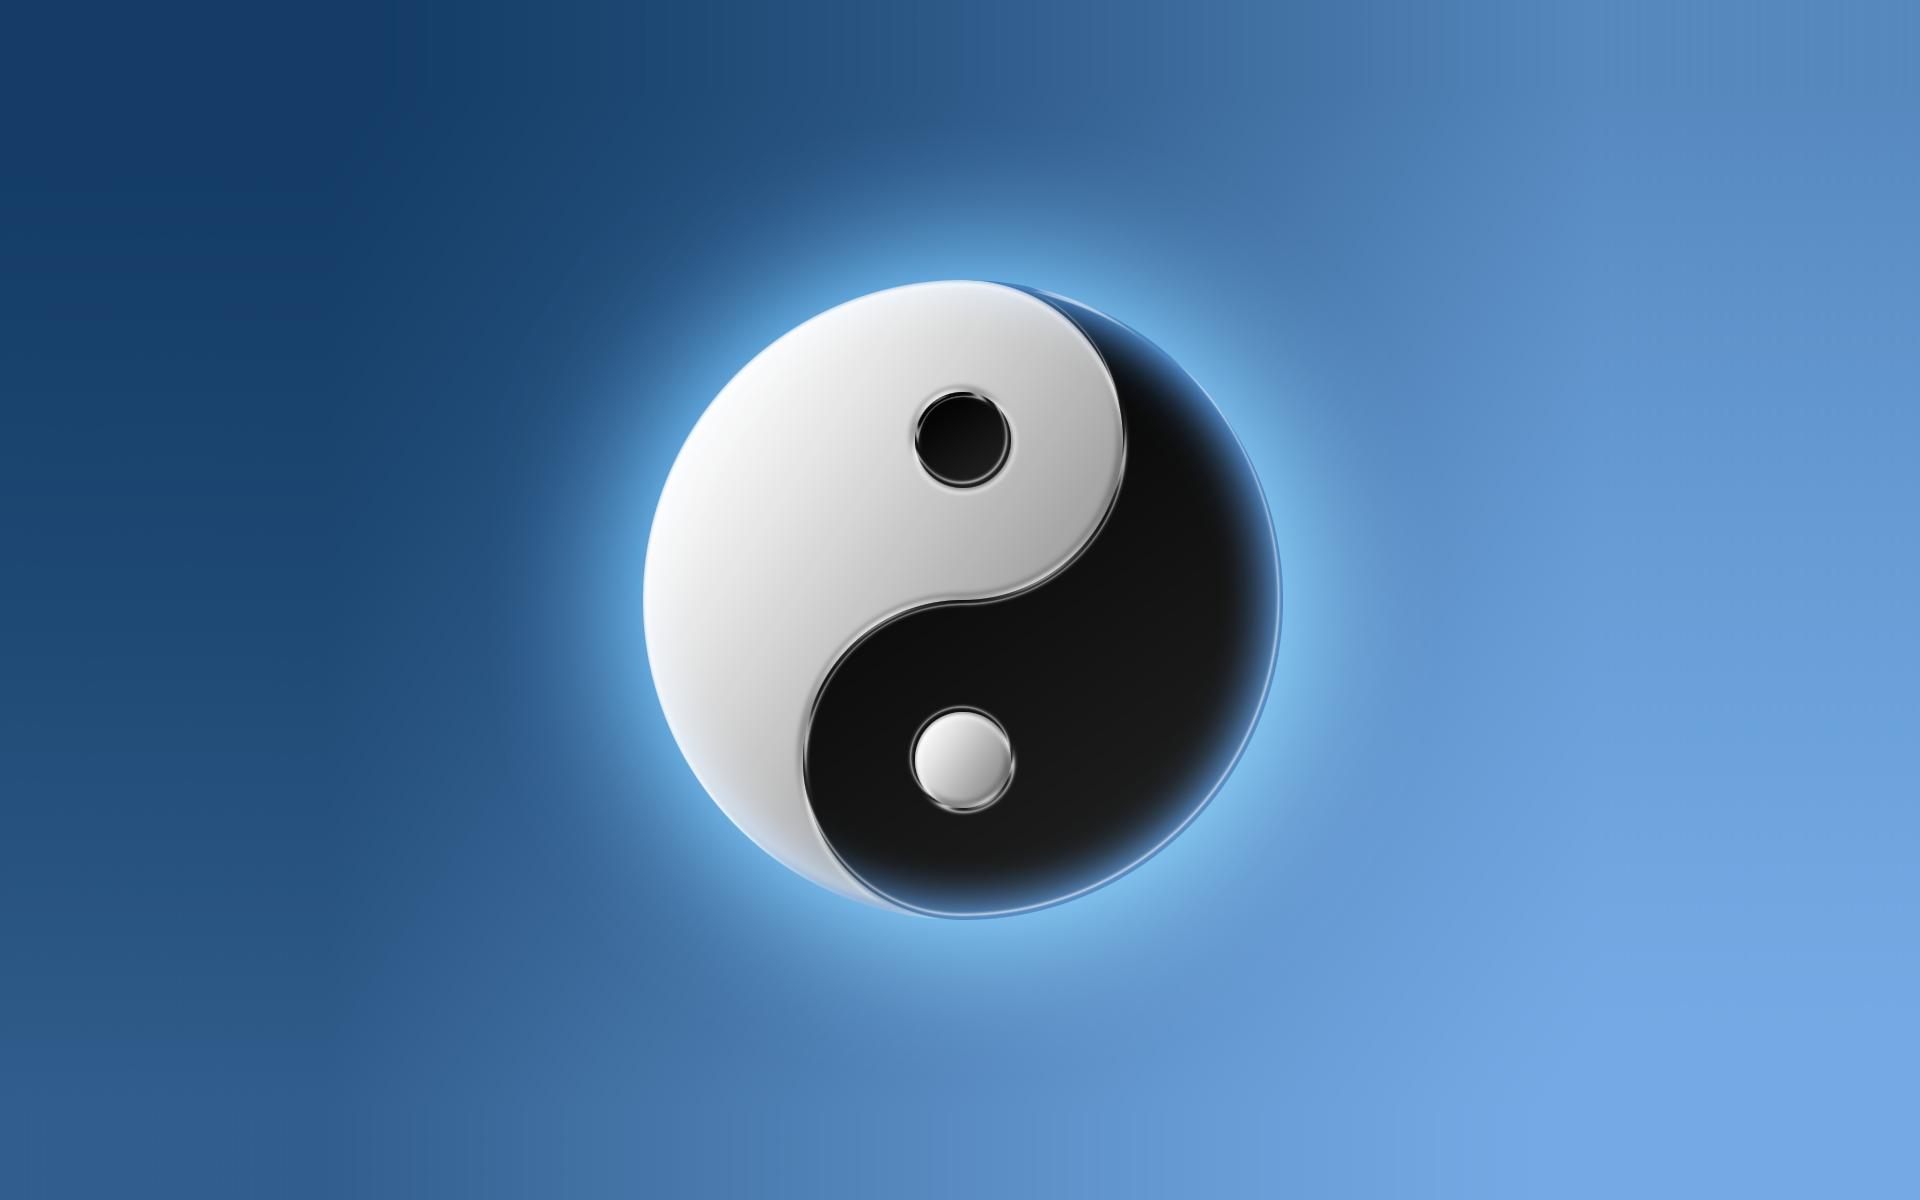 Yin yang hd wallpaper wallpapersafari - Yin and yang wallpaper ...